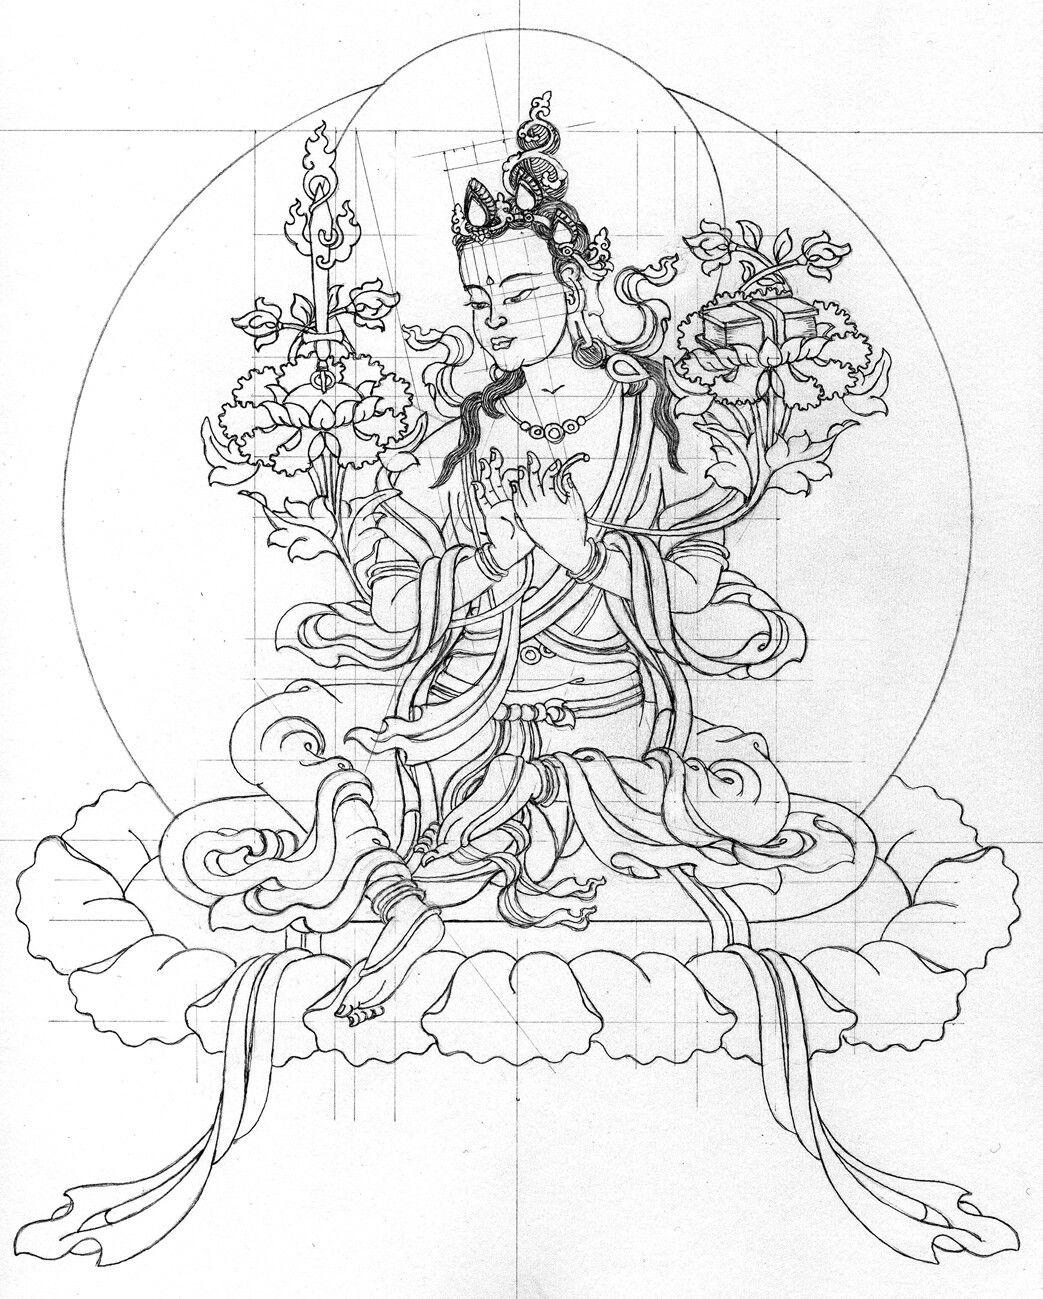 Pin de Marguerite en Buddha\'s | Pinterest | Dibujo y Arte